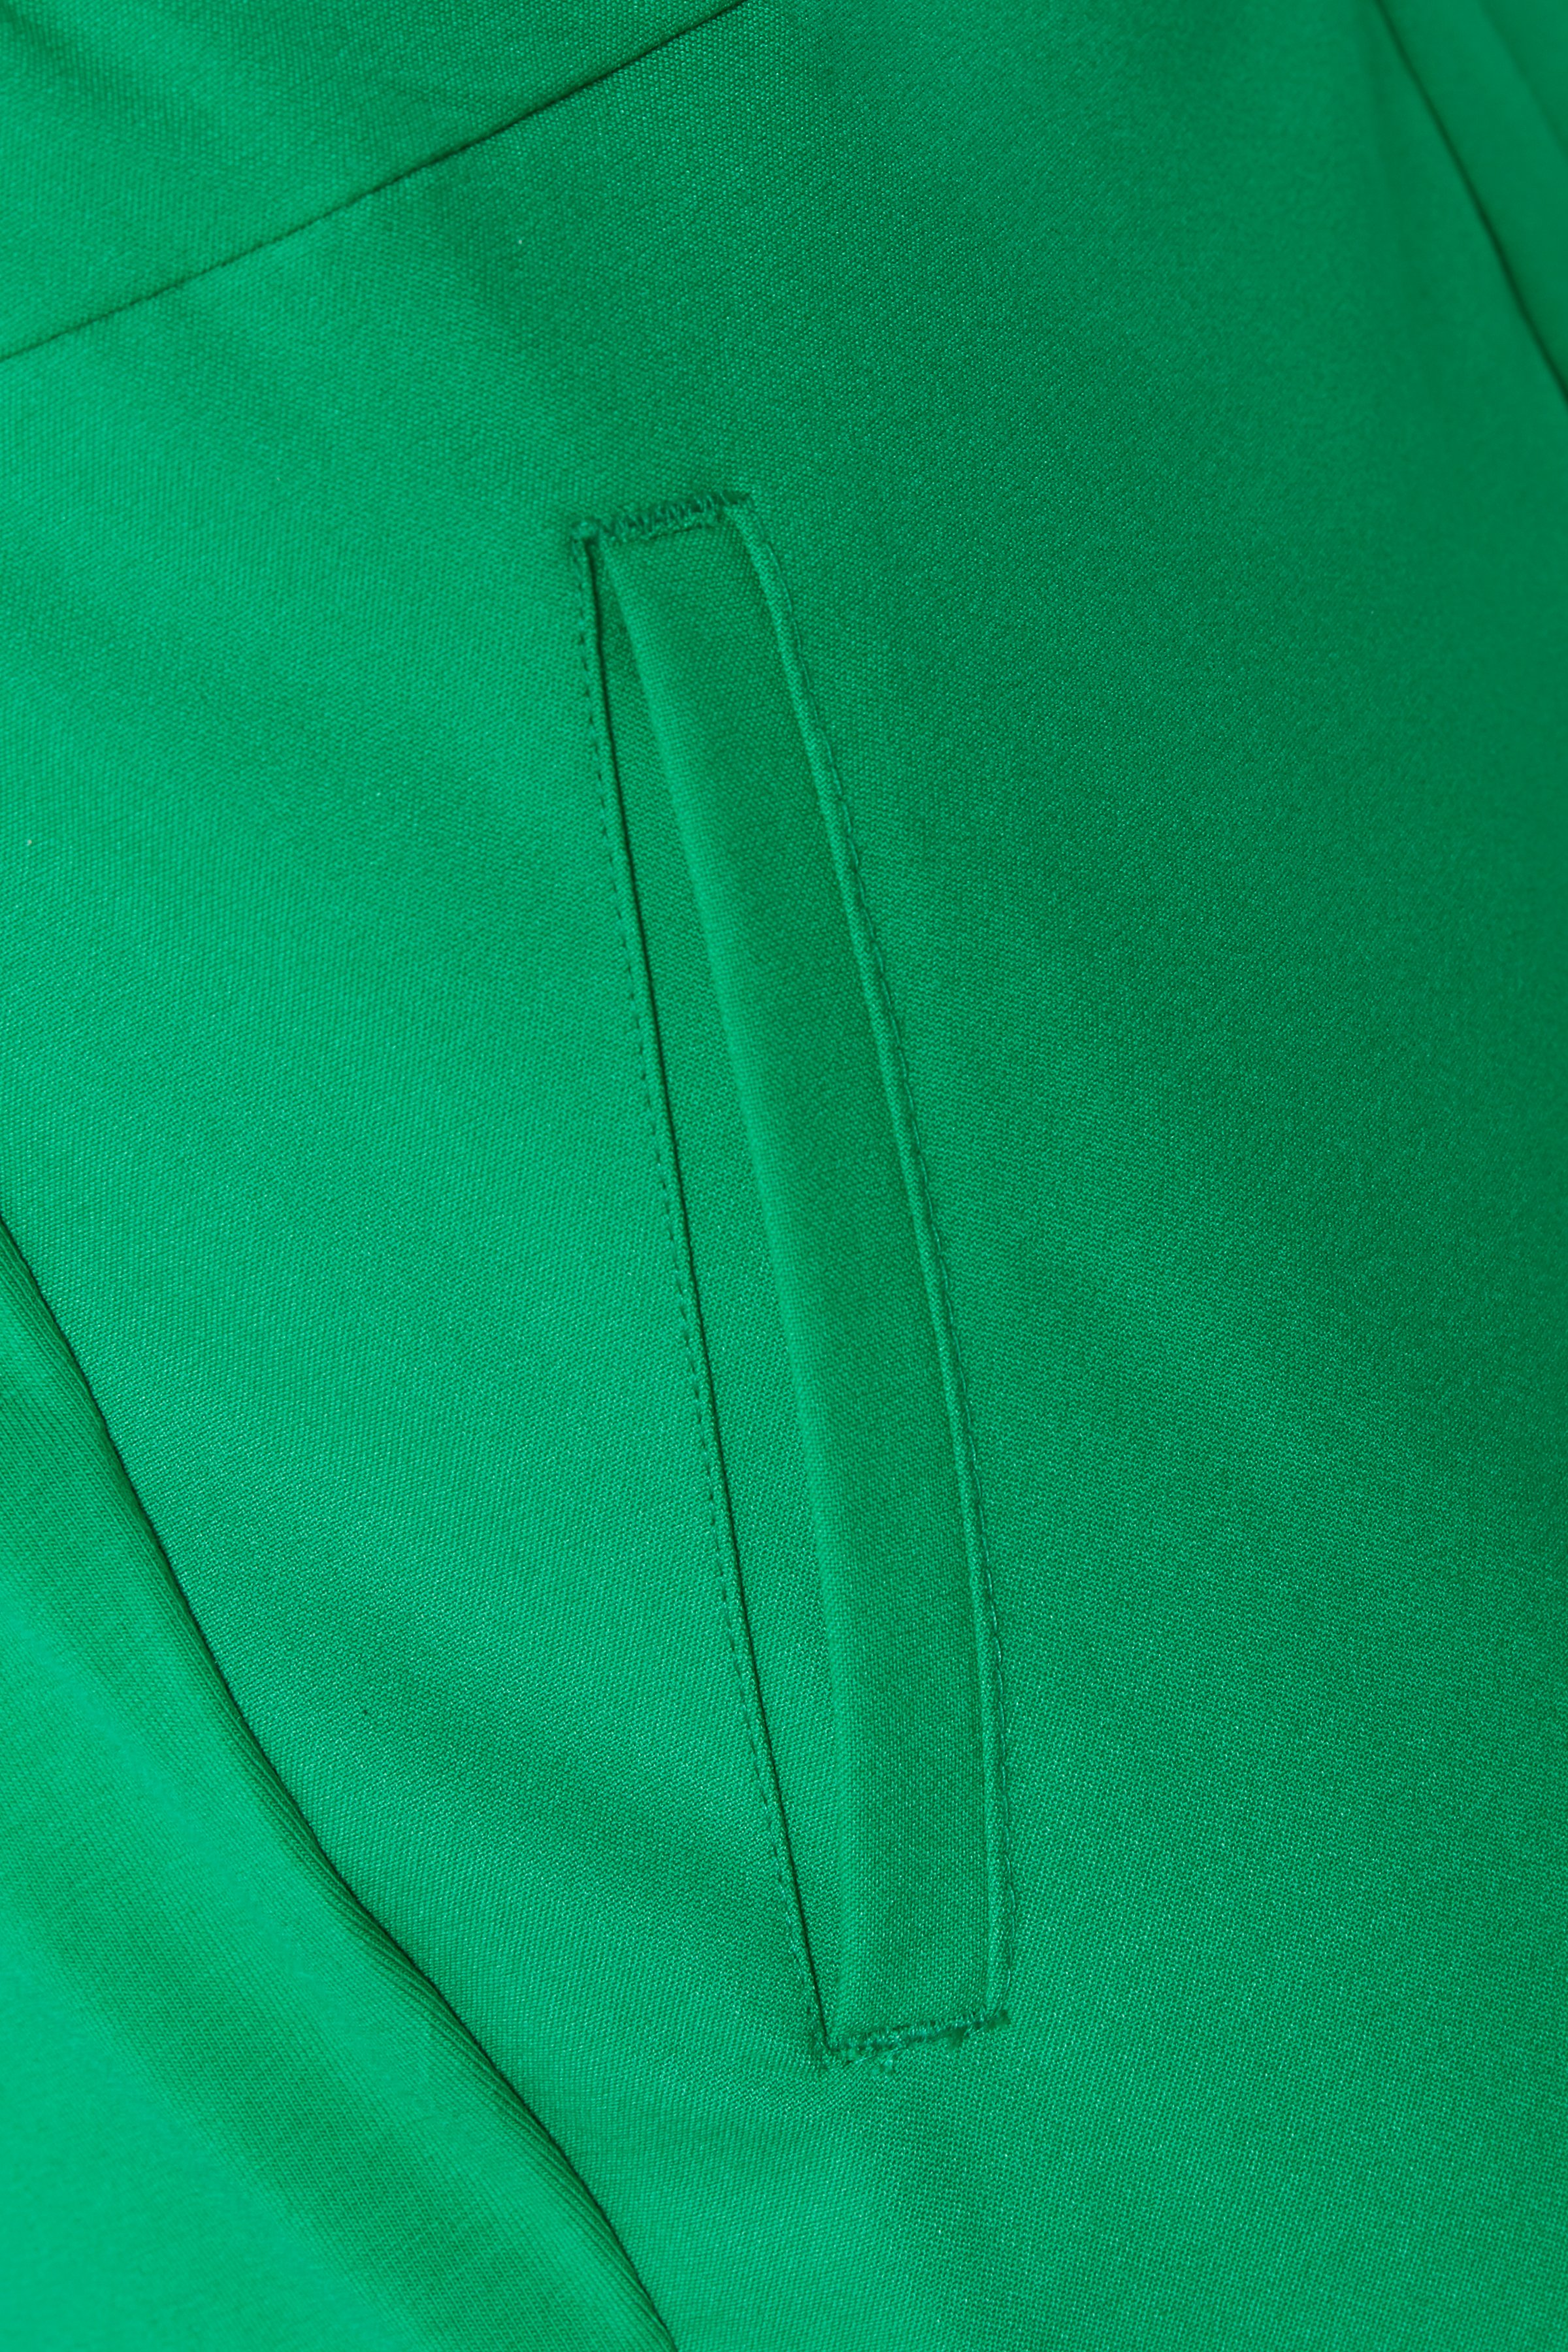 Grün Caprihose von Kaffe – Shoppen Sie Grün Caprihose ab Gr. 32-46 hier